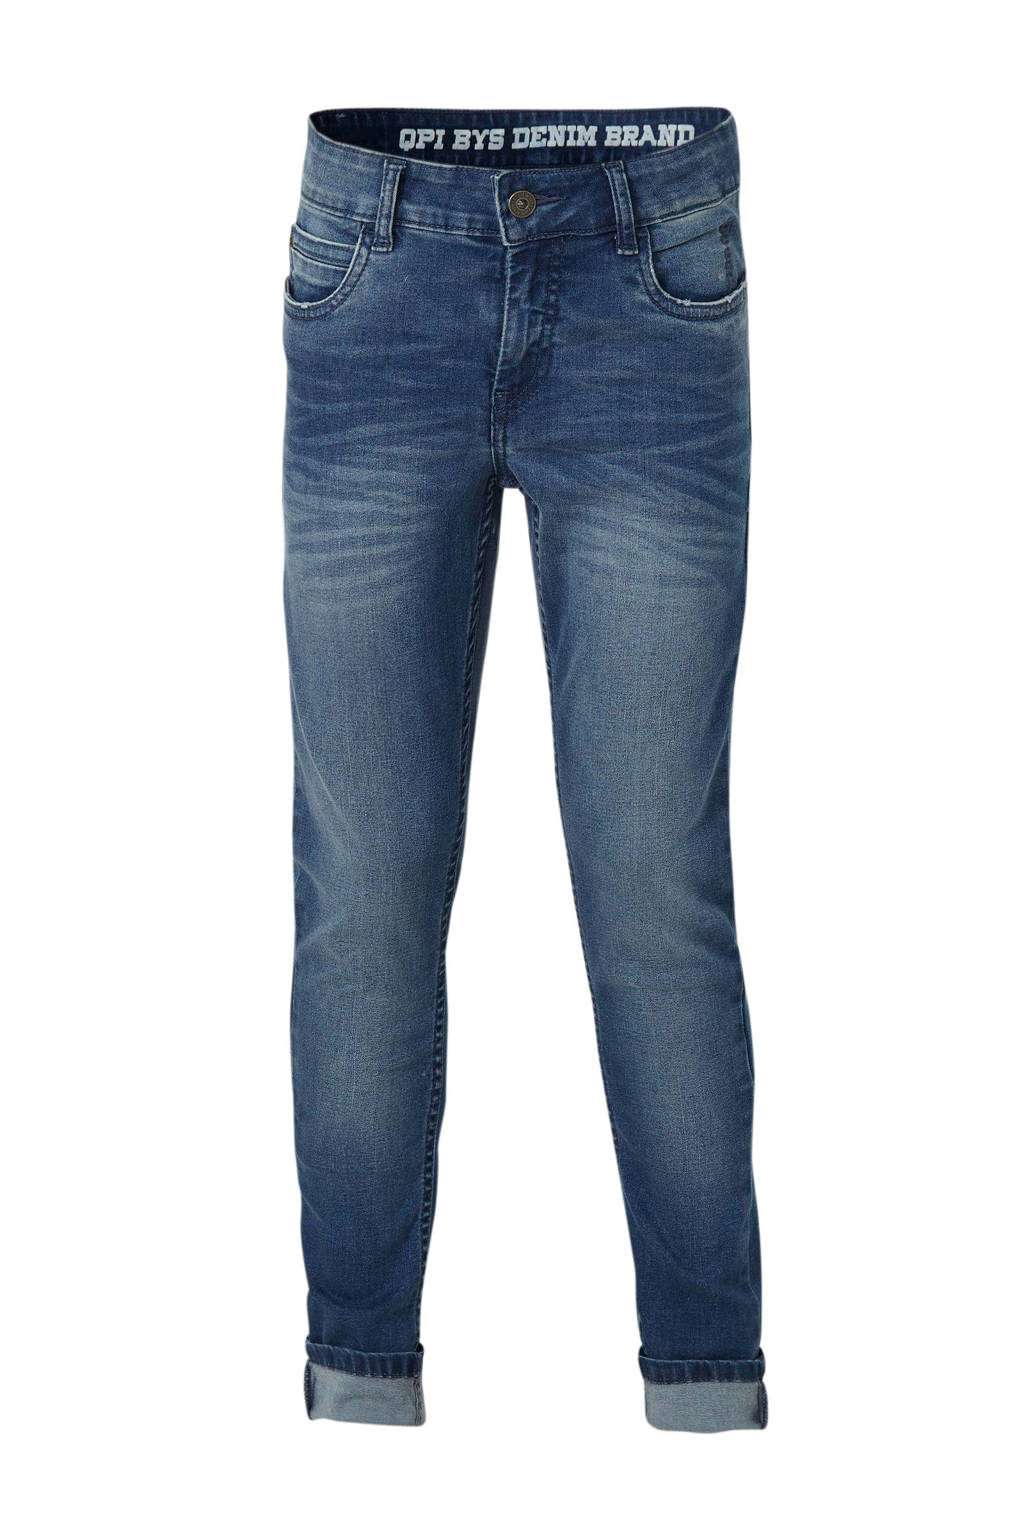 Quapi regular fit jeans Jake light denim, Light denim